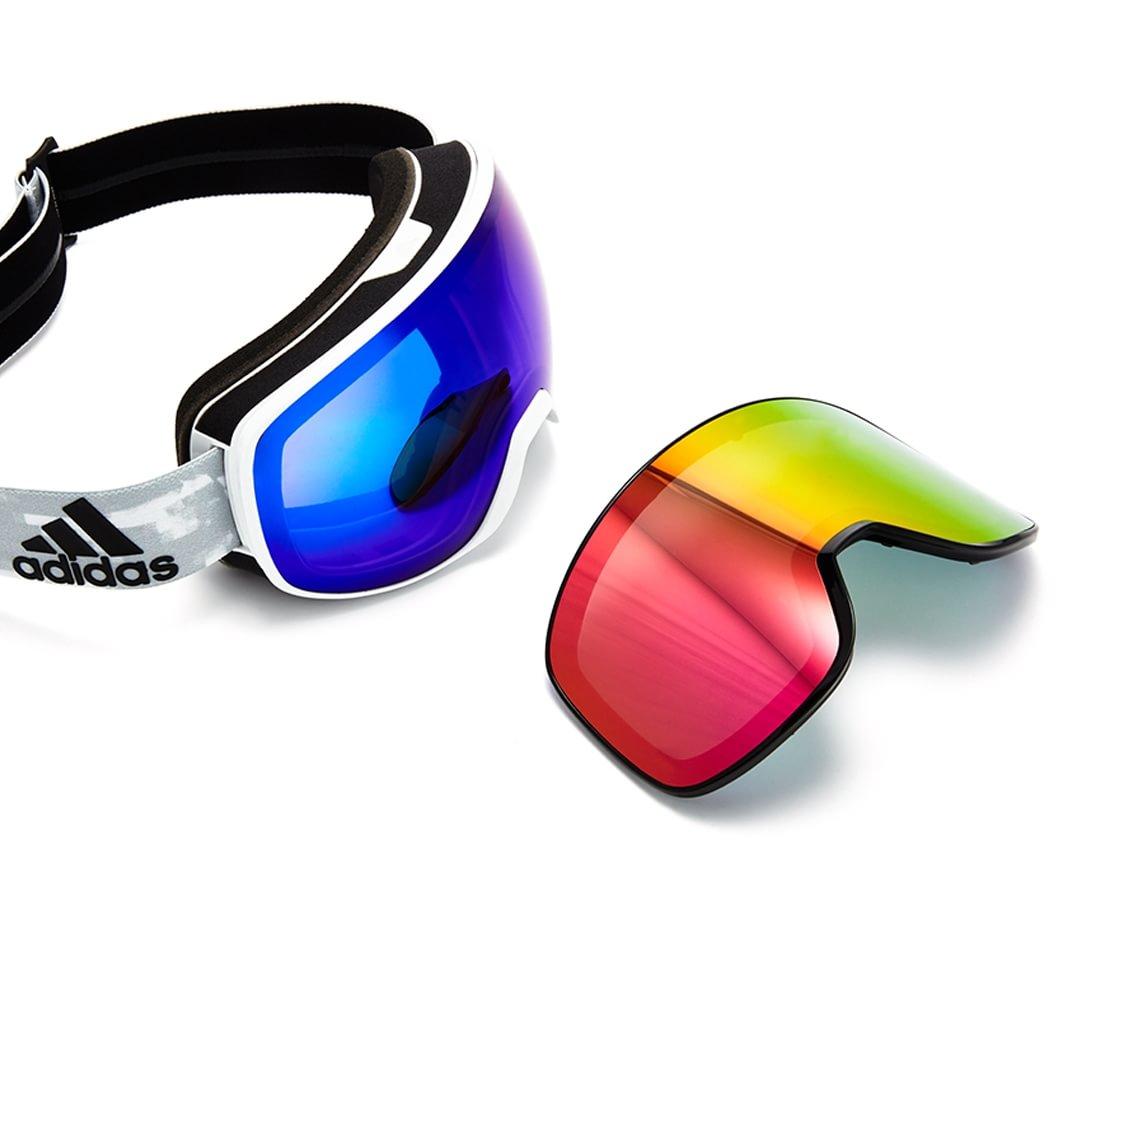 Adidas Pro Pack Ad83 50 6052